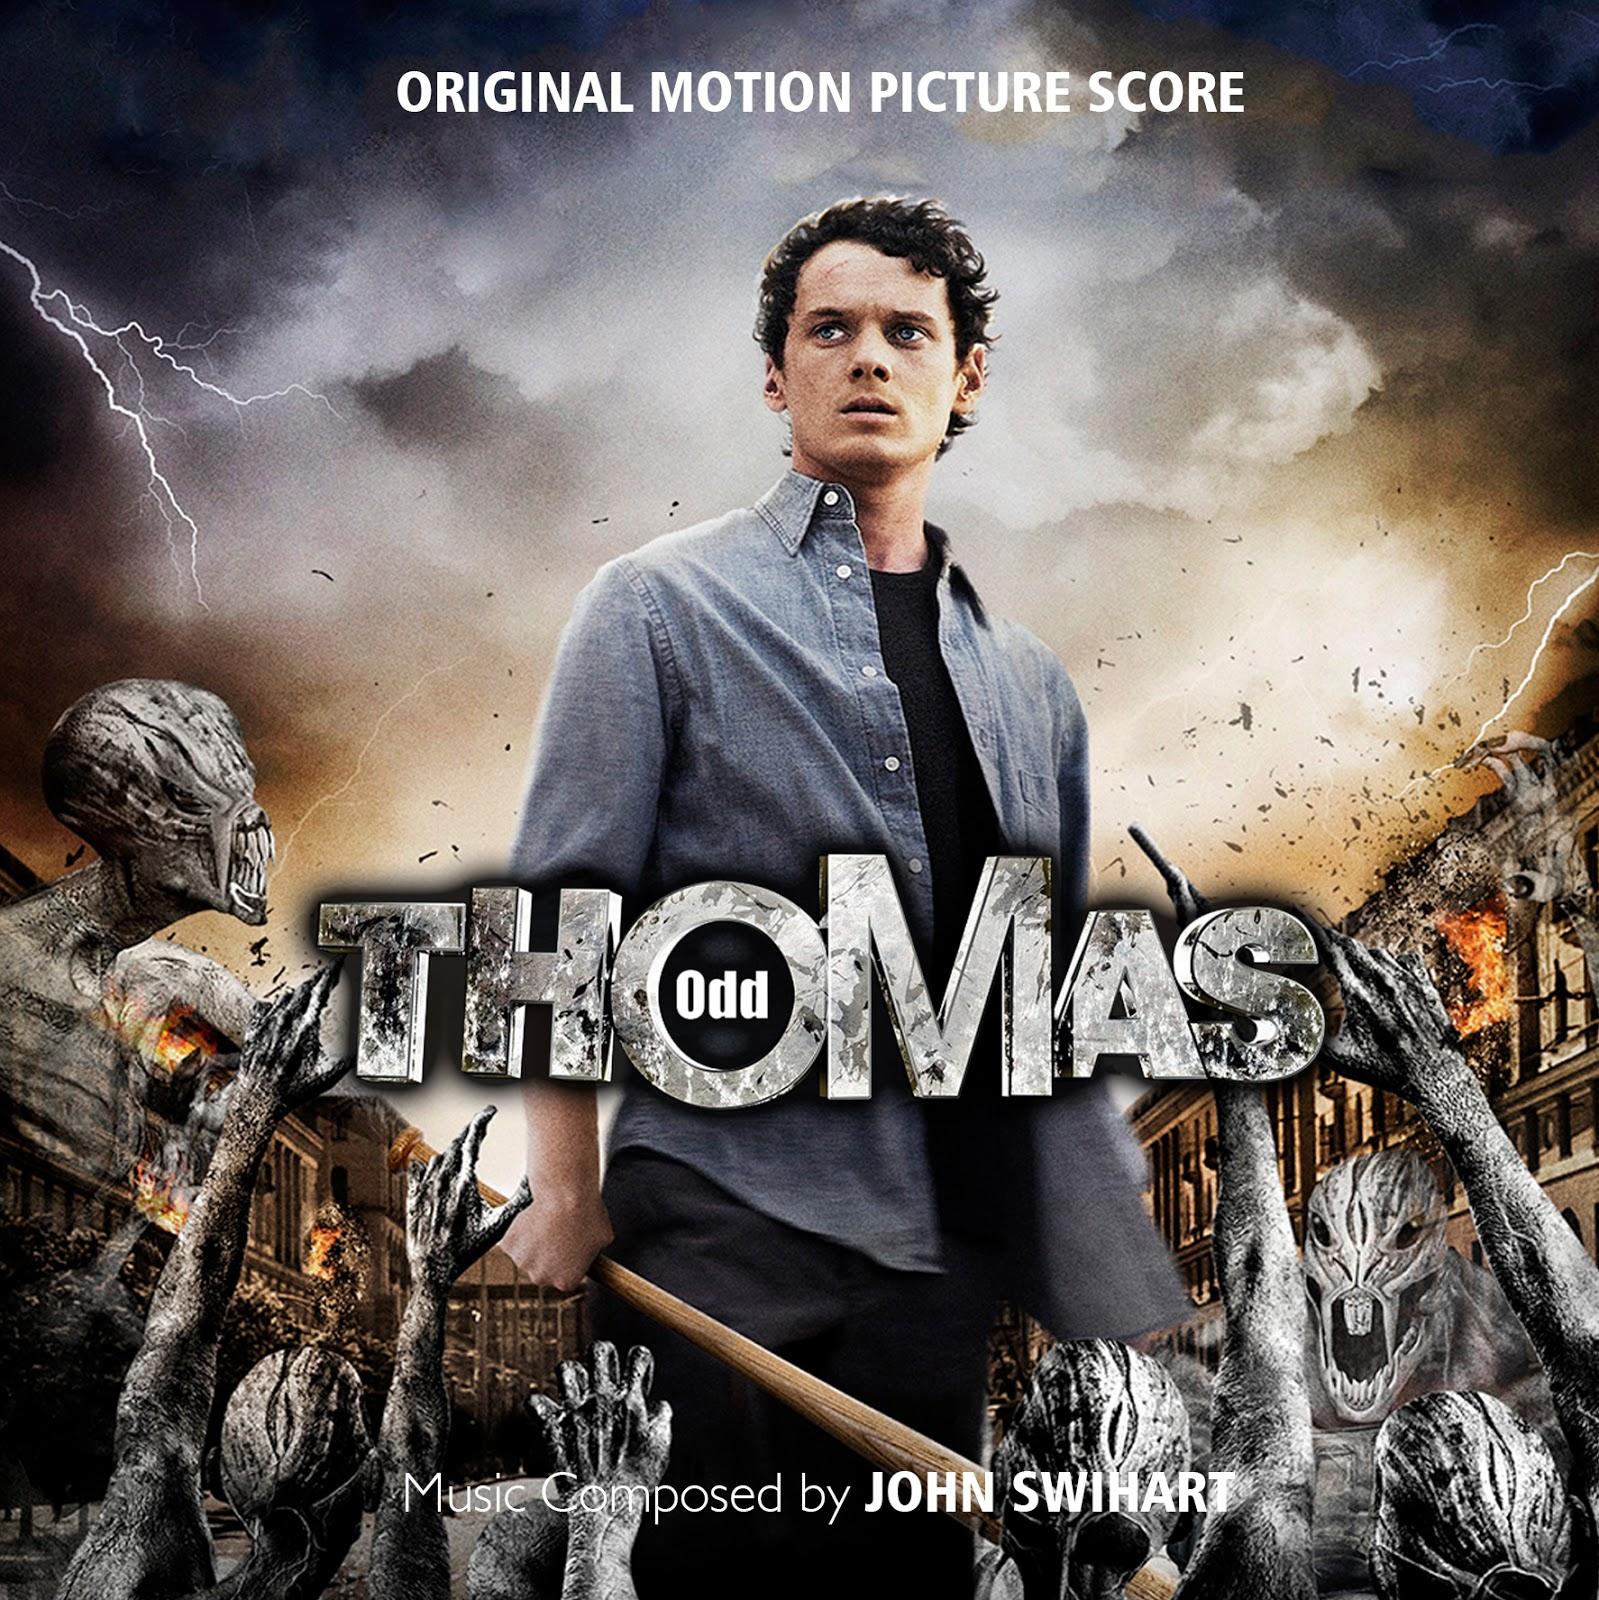 Odd Thomas 2